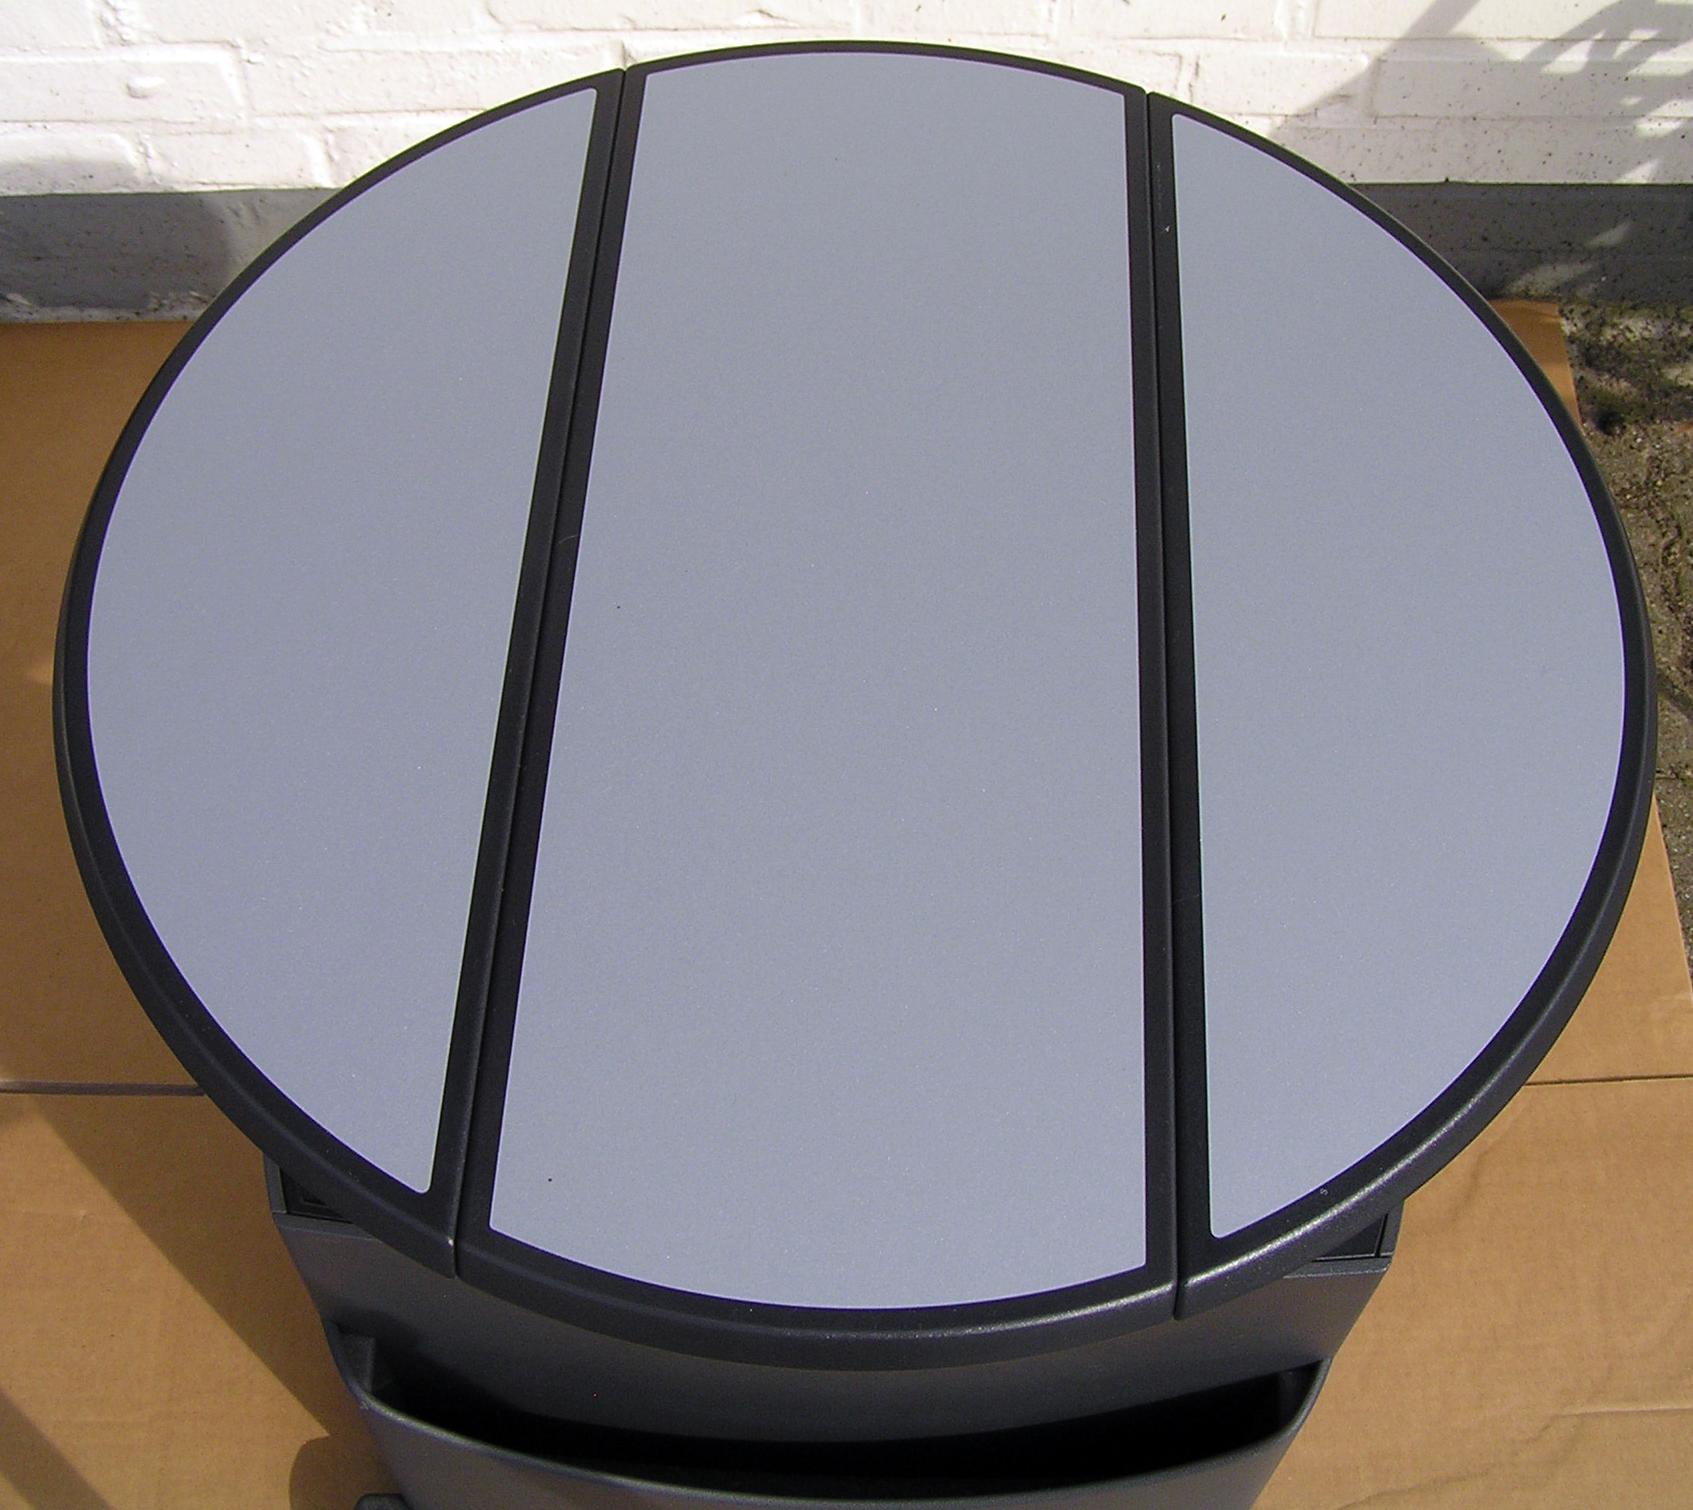 vw t5 table multifunction table f rail system light grey. Black Bedroom Furniture Sets. Home Design Ideas